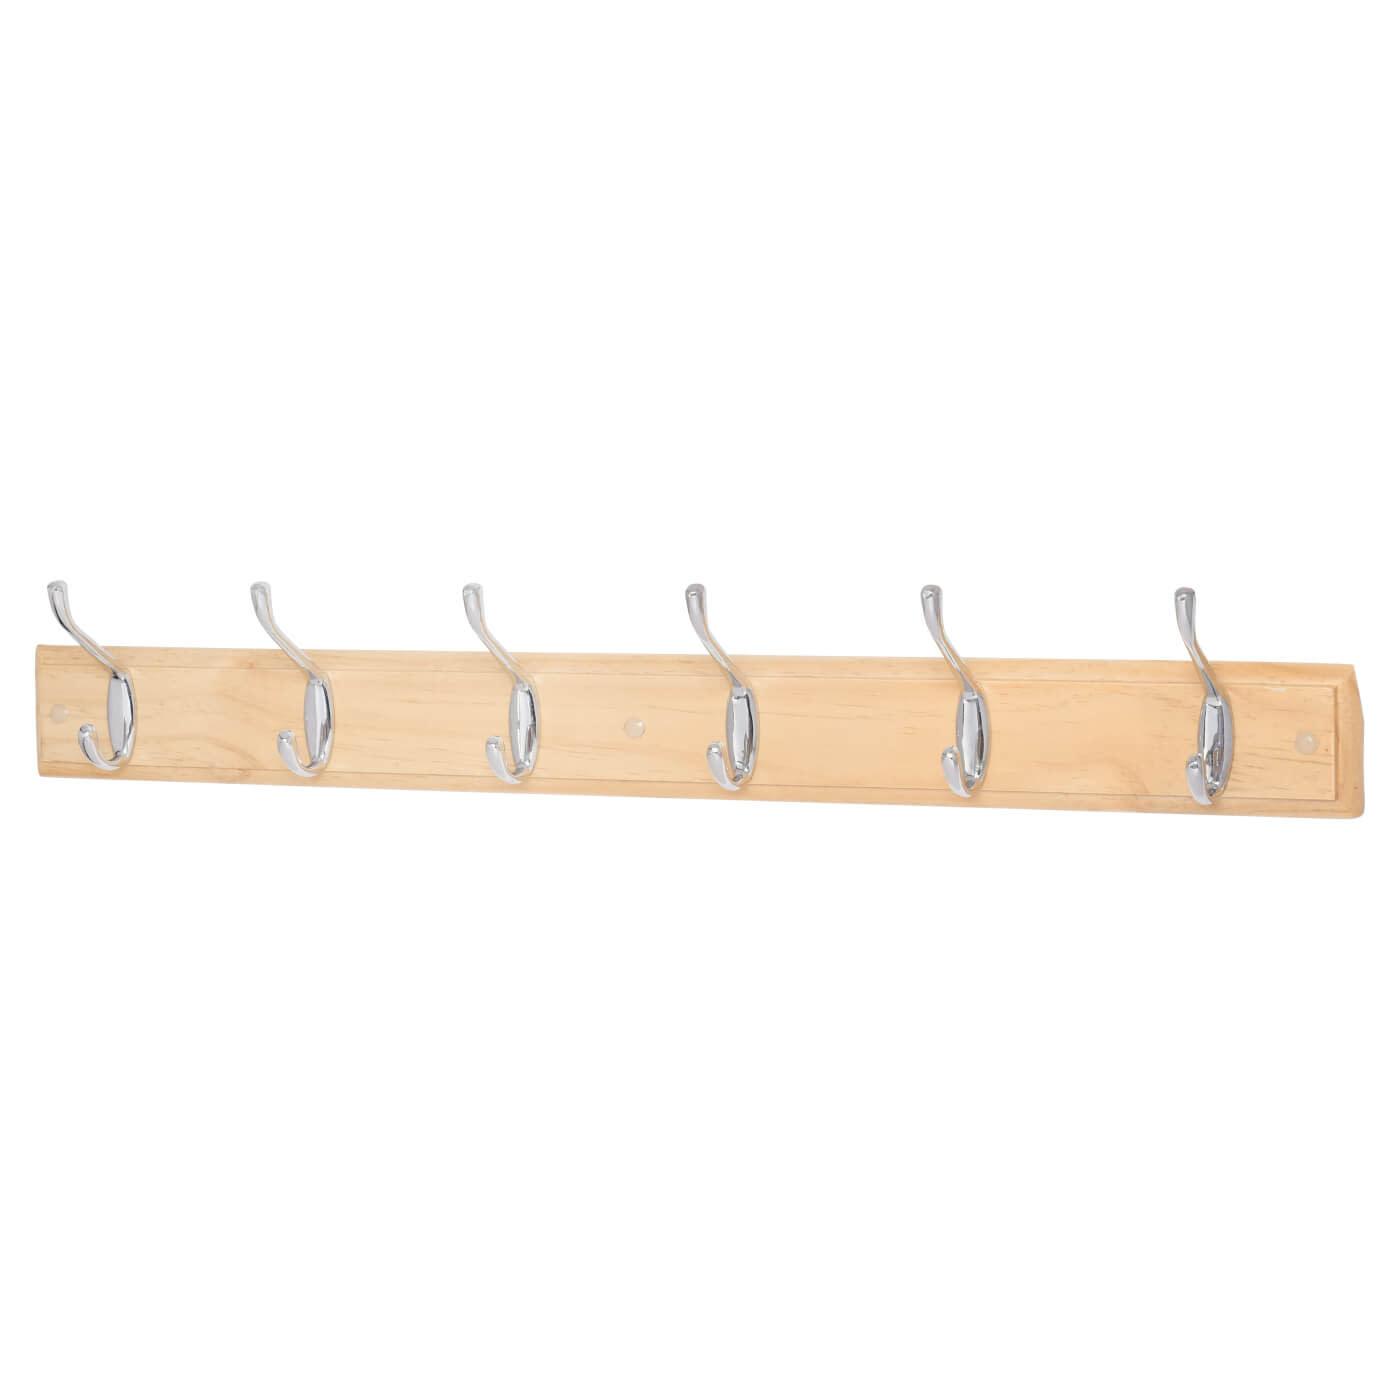 Hat and Coat Hook Rail - 6 Hook - Pine Board with Polished Chrome Hooks)